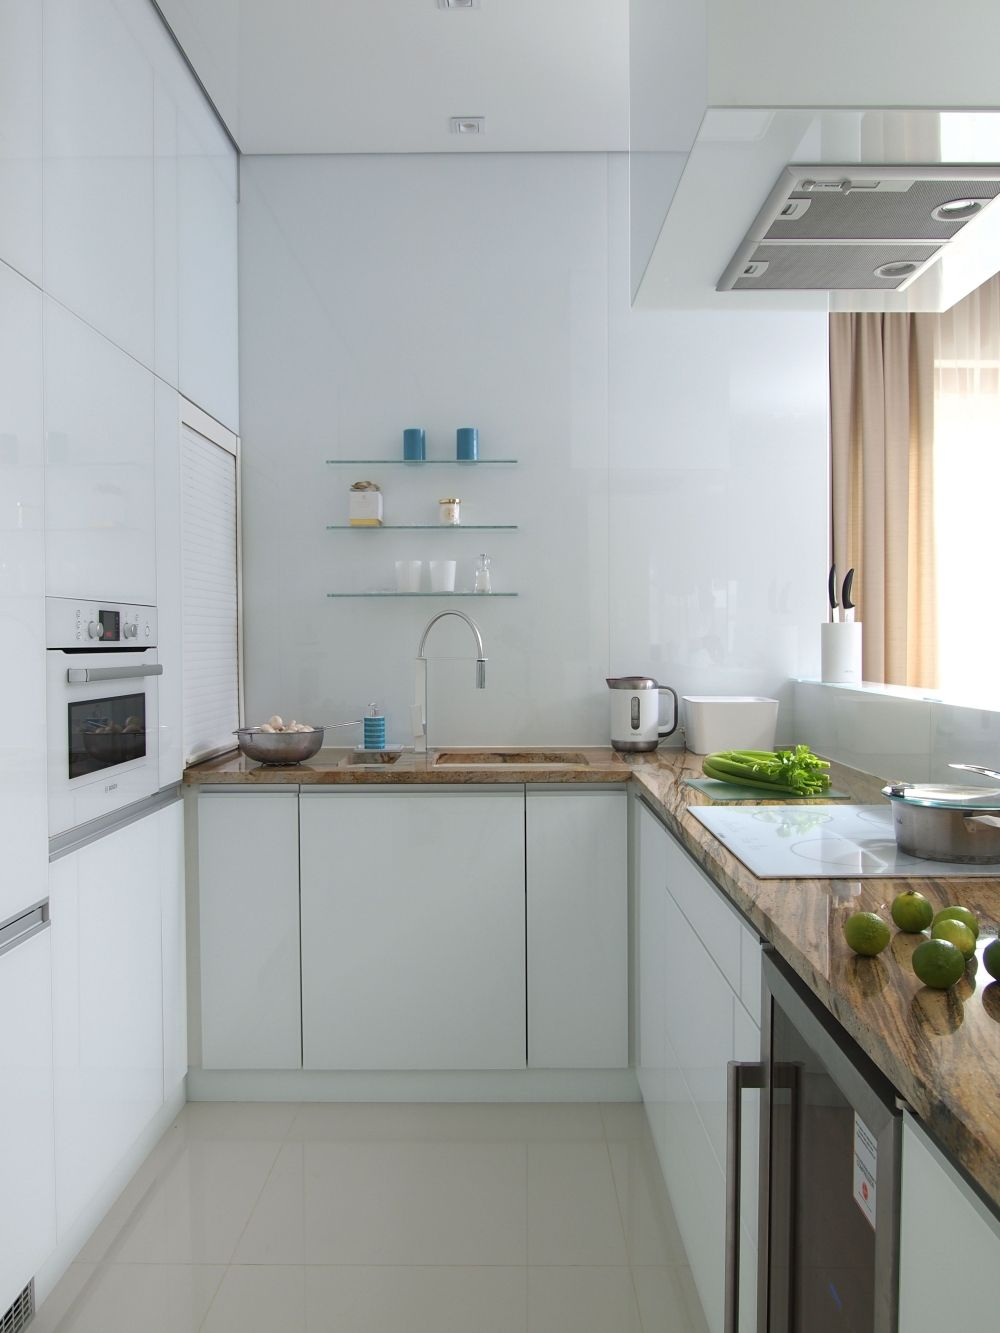 Biala Kuchnia Swietny Pomysl Do Malej Kuchni Home Kitchens Kitchen Small Kitchen